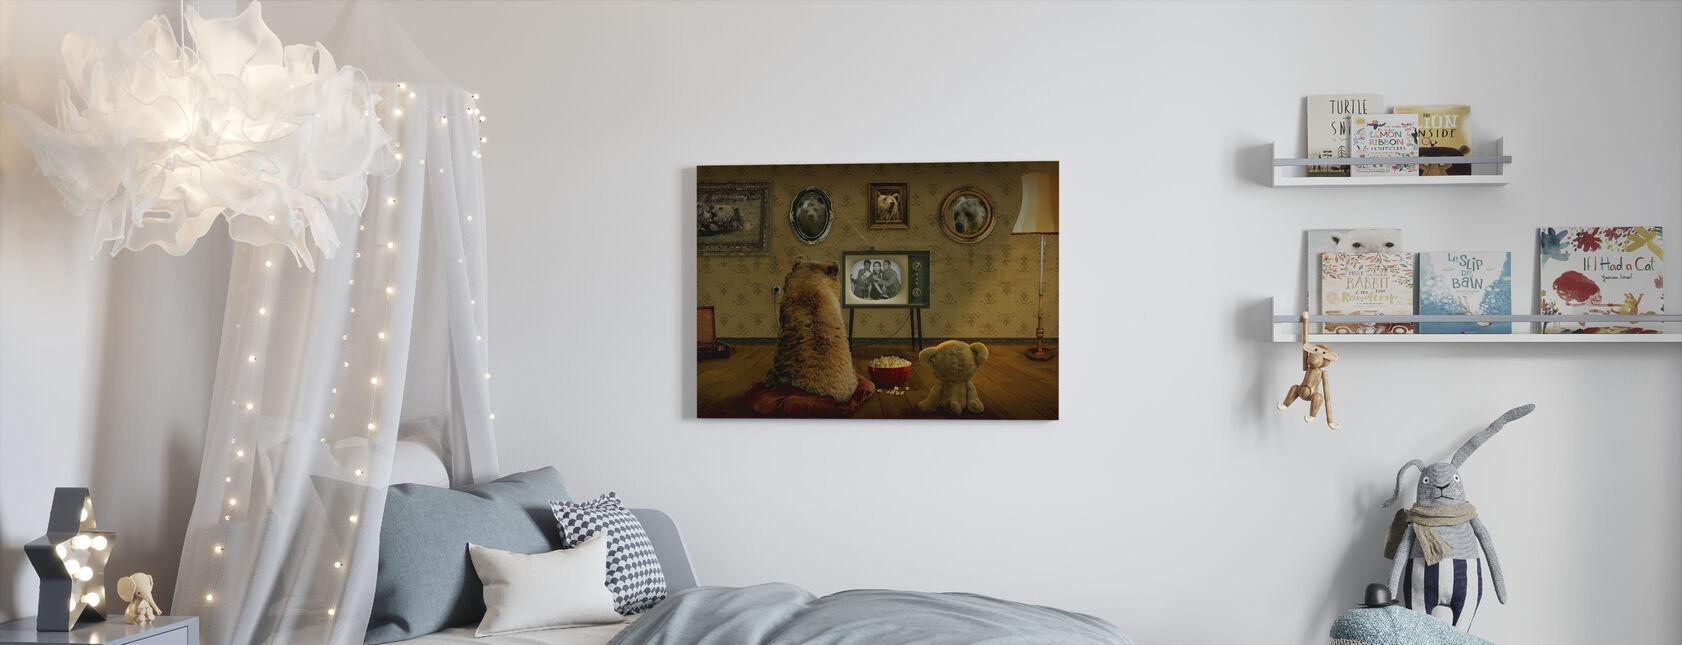 Bear and Teddy - Canvas print - Kids Room